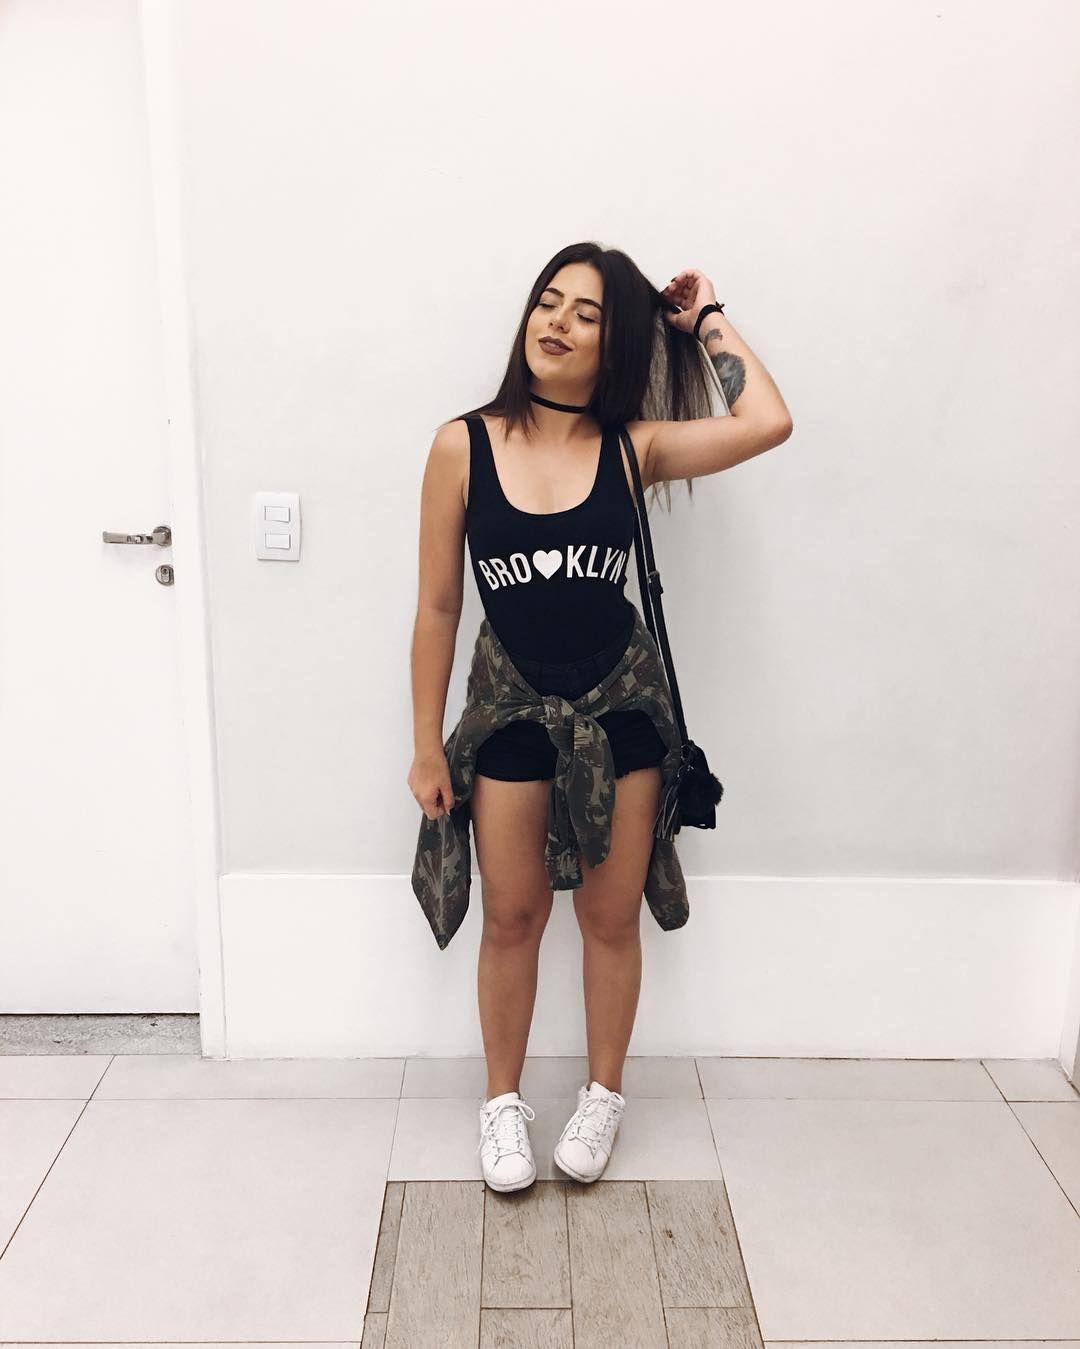 pindrishti bhati 💜💟💜💟🍫🍫 on cant have too many fashion